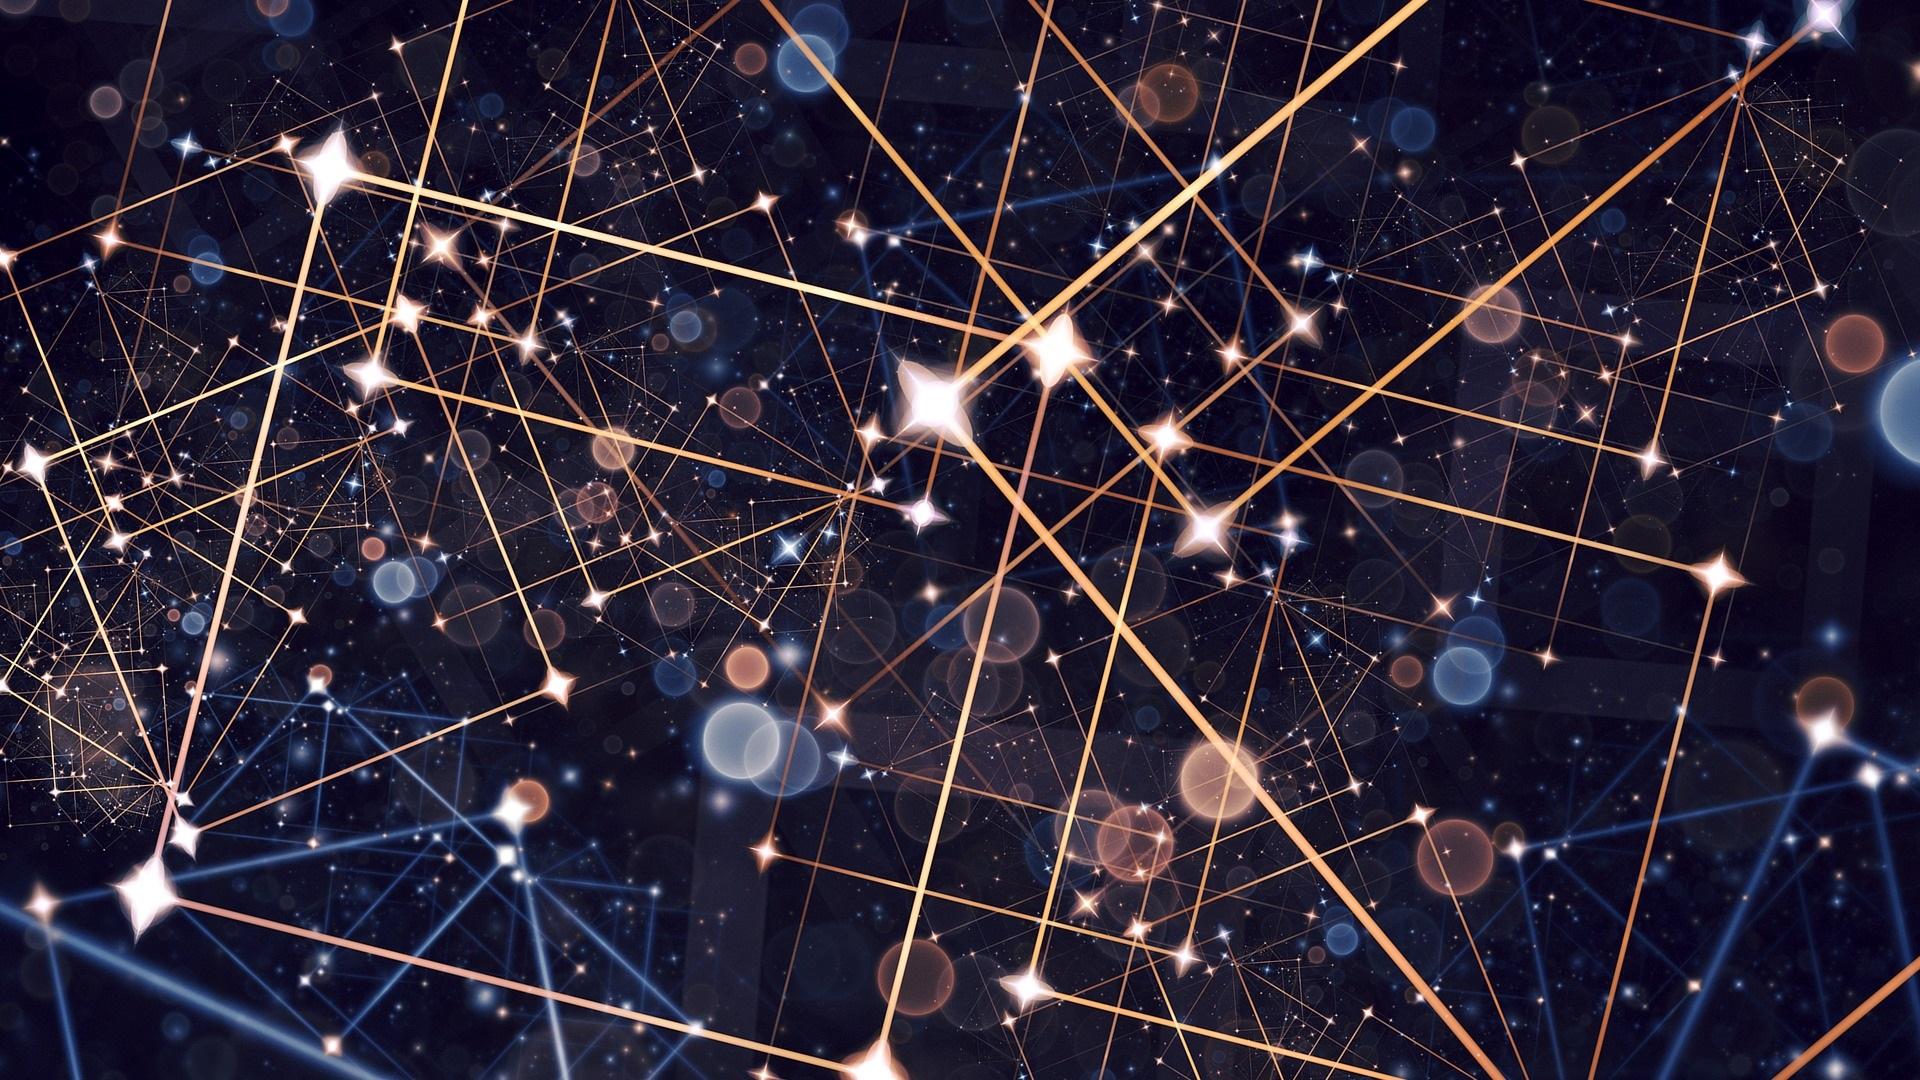 1920x1080 Abstracto Full Hd 1920x1080: Fondos De Pantalla Estrellas, Líneas, Fondo Abstracto